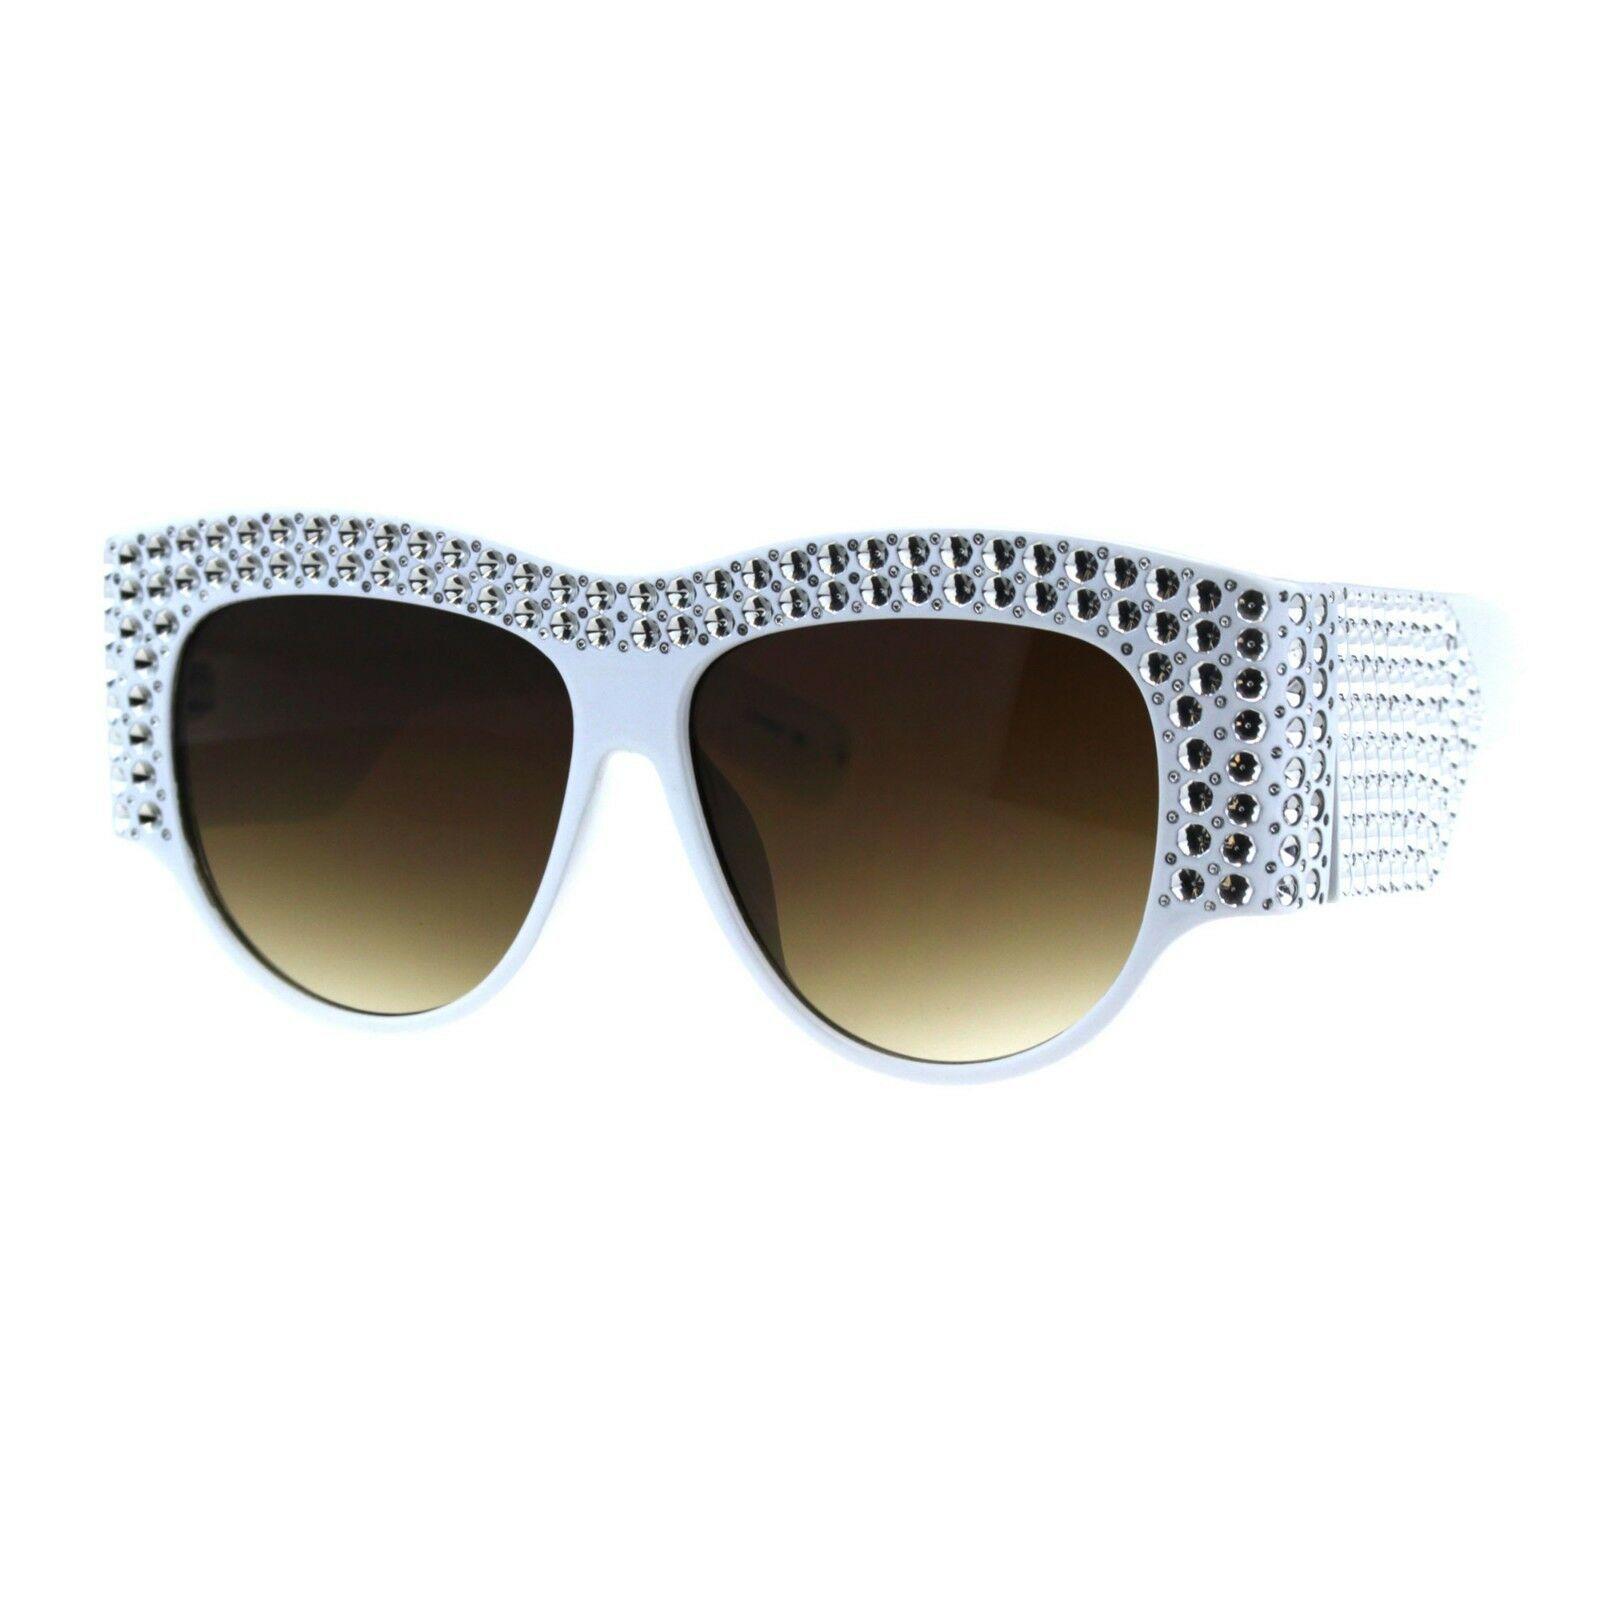 Womens Sunglasses Bold Thick Oversized Frame Silver Bling Decor UV 400